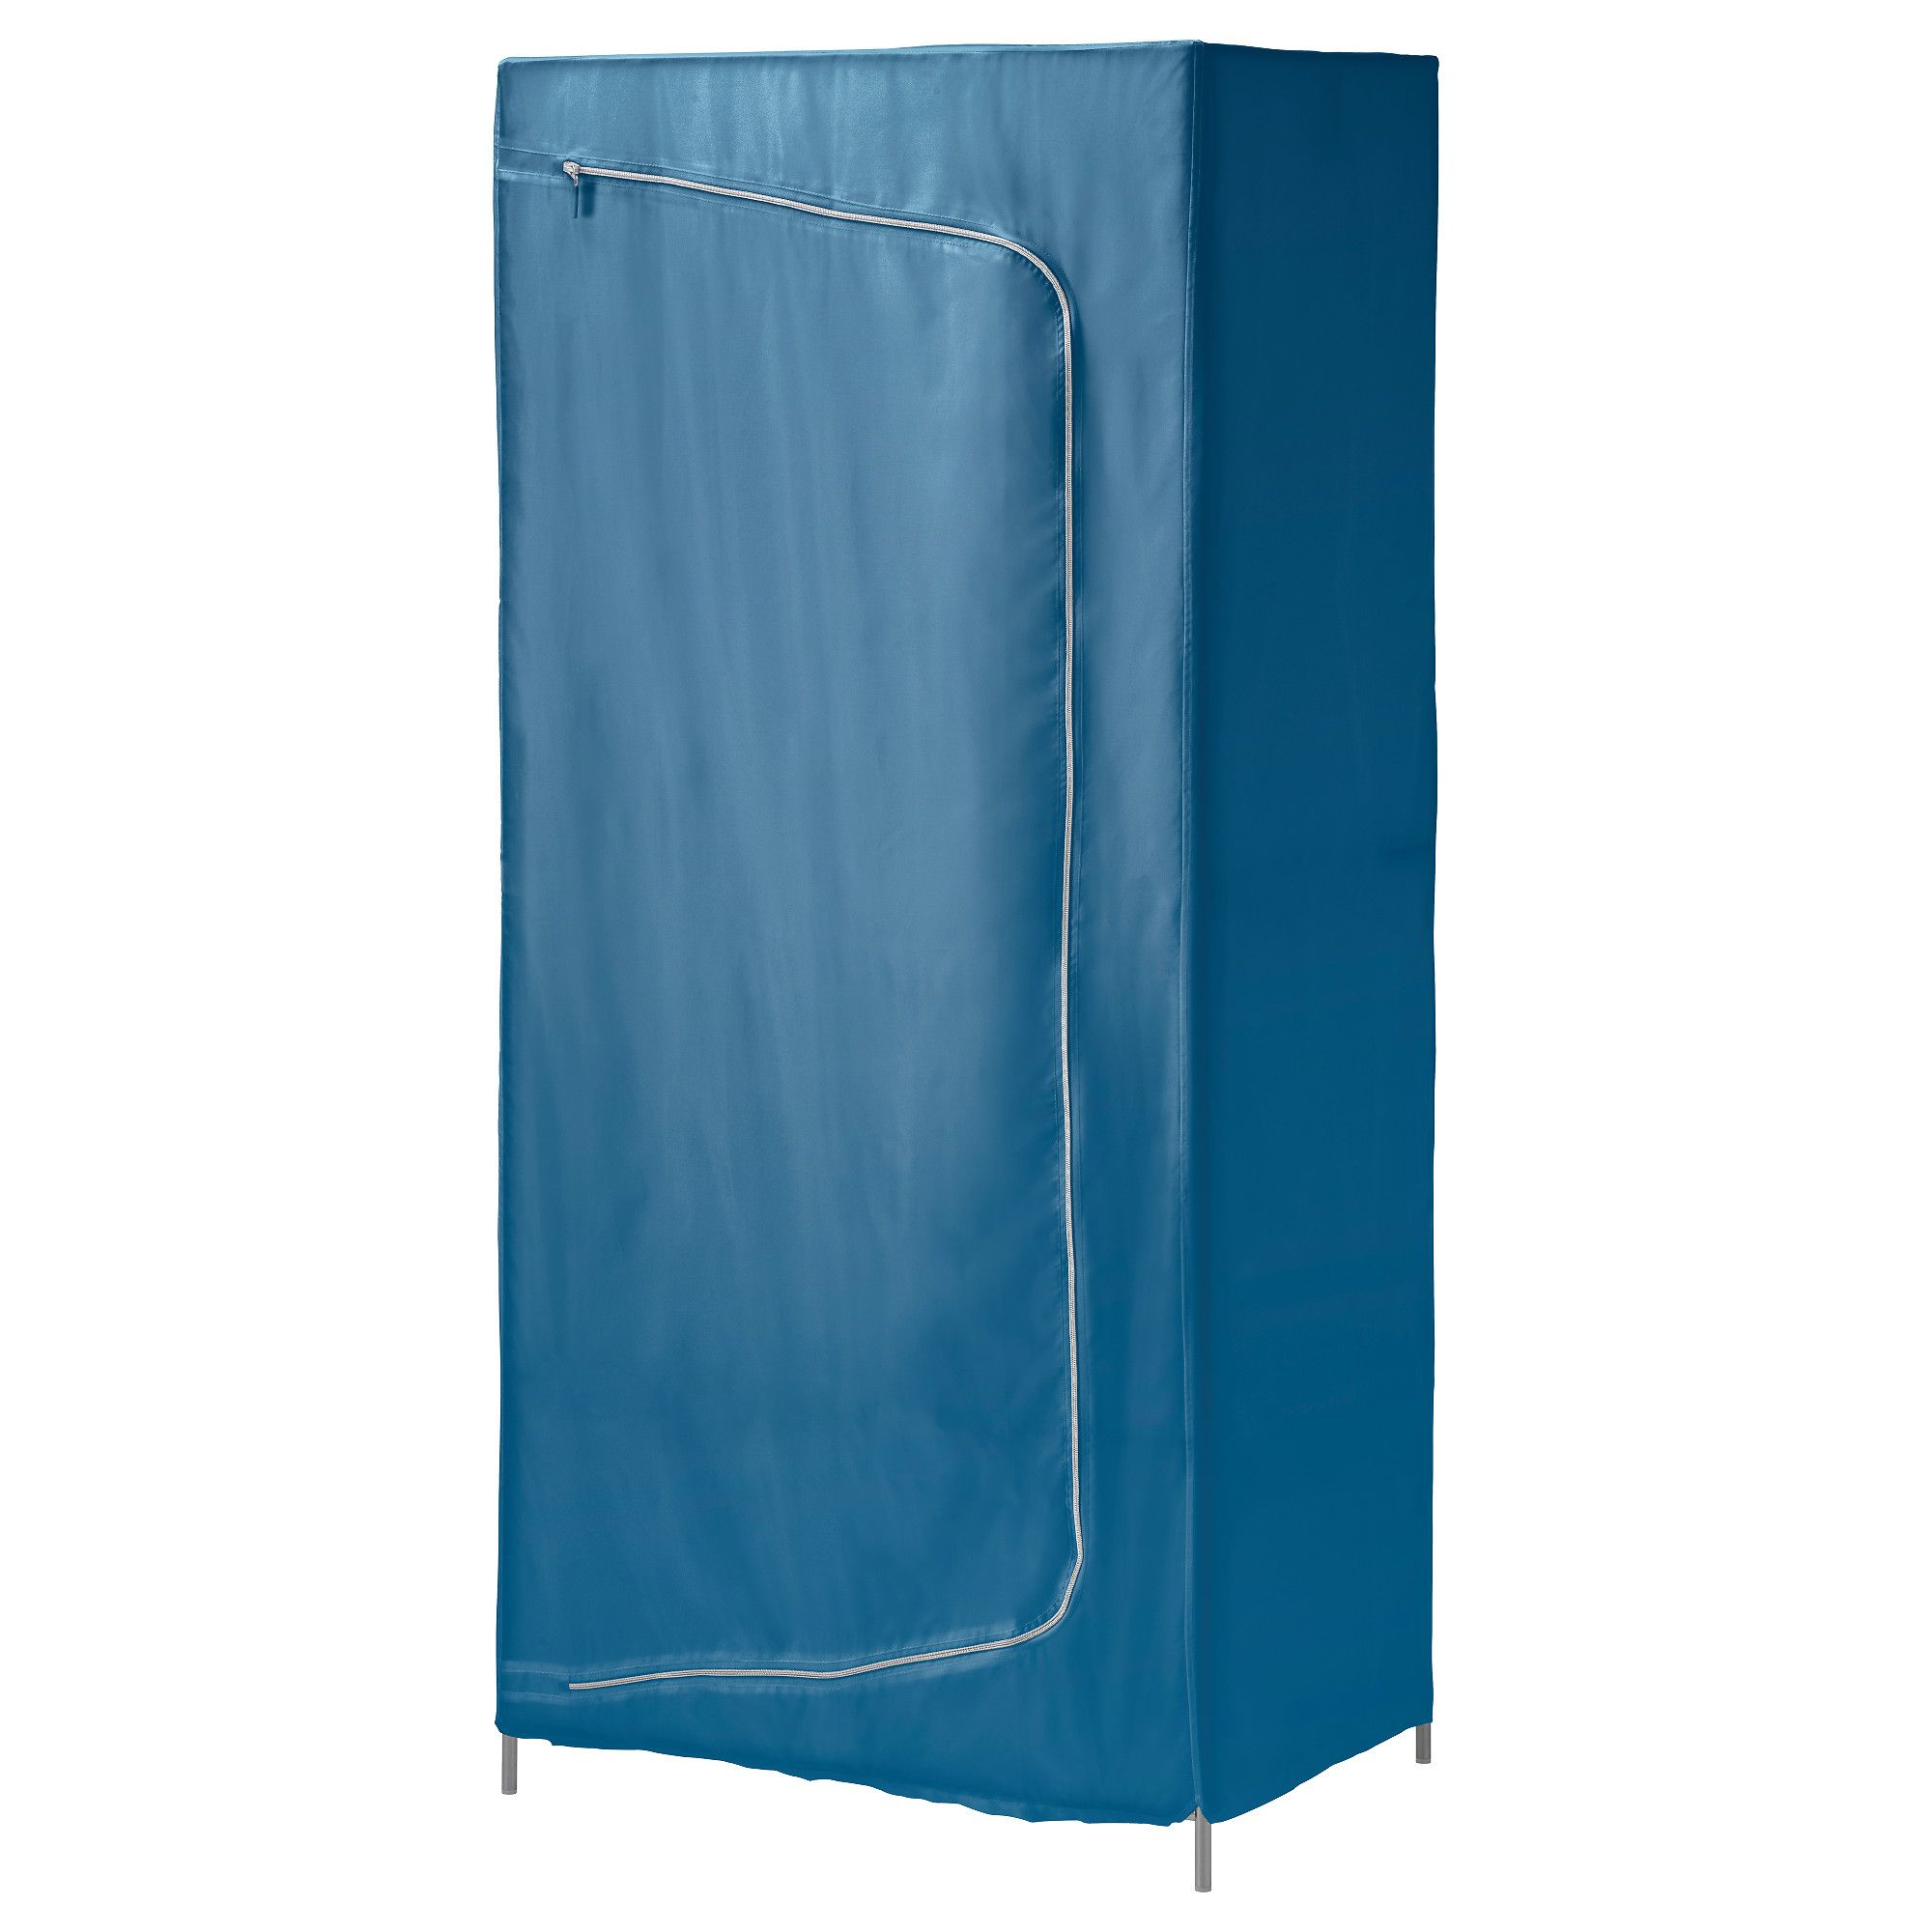 Australia Ikea wardrobe, Blue bedroom furniture, Ikea